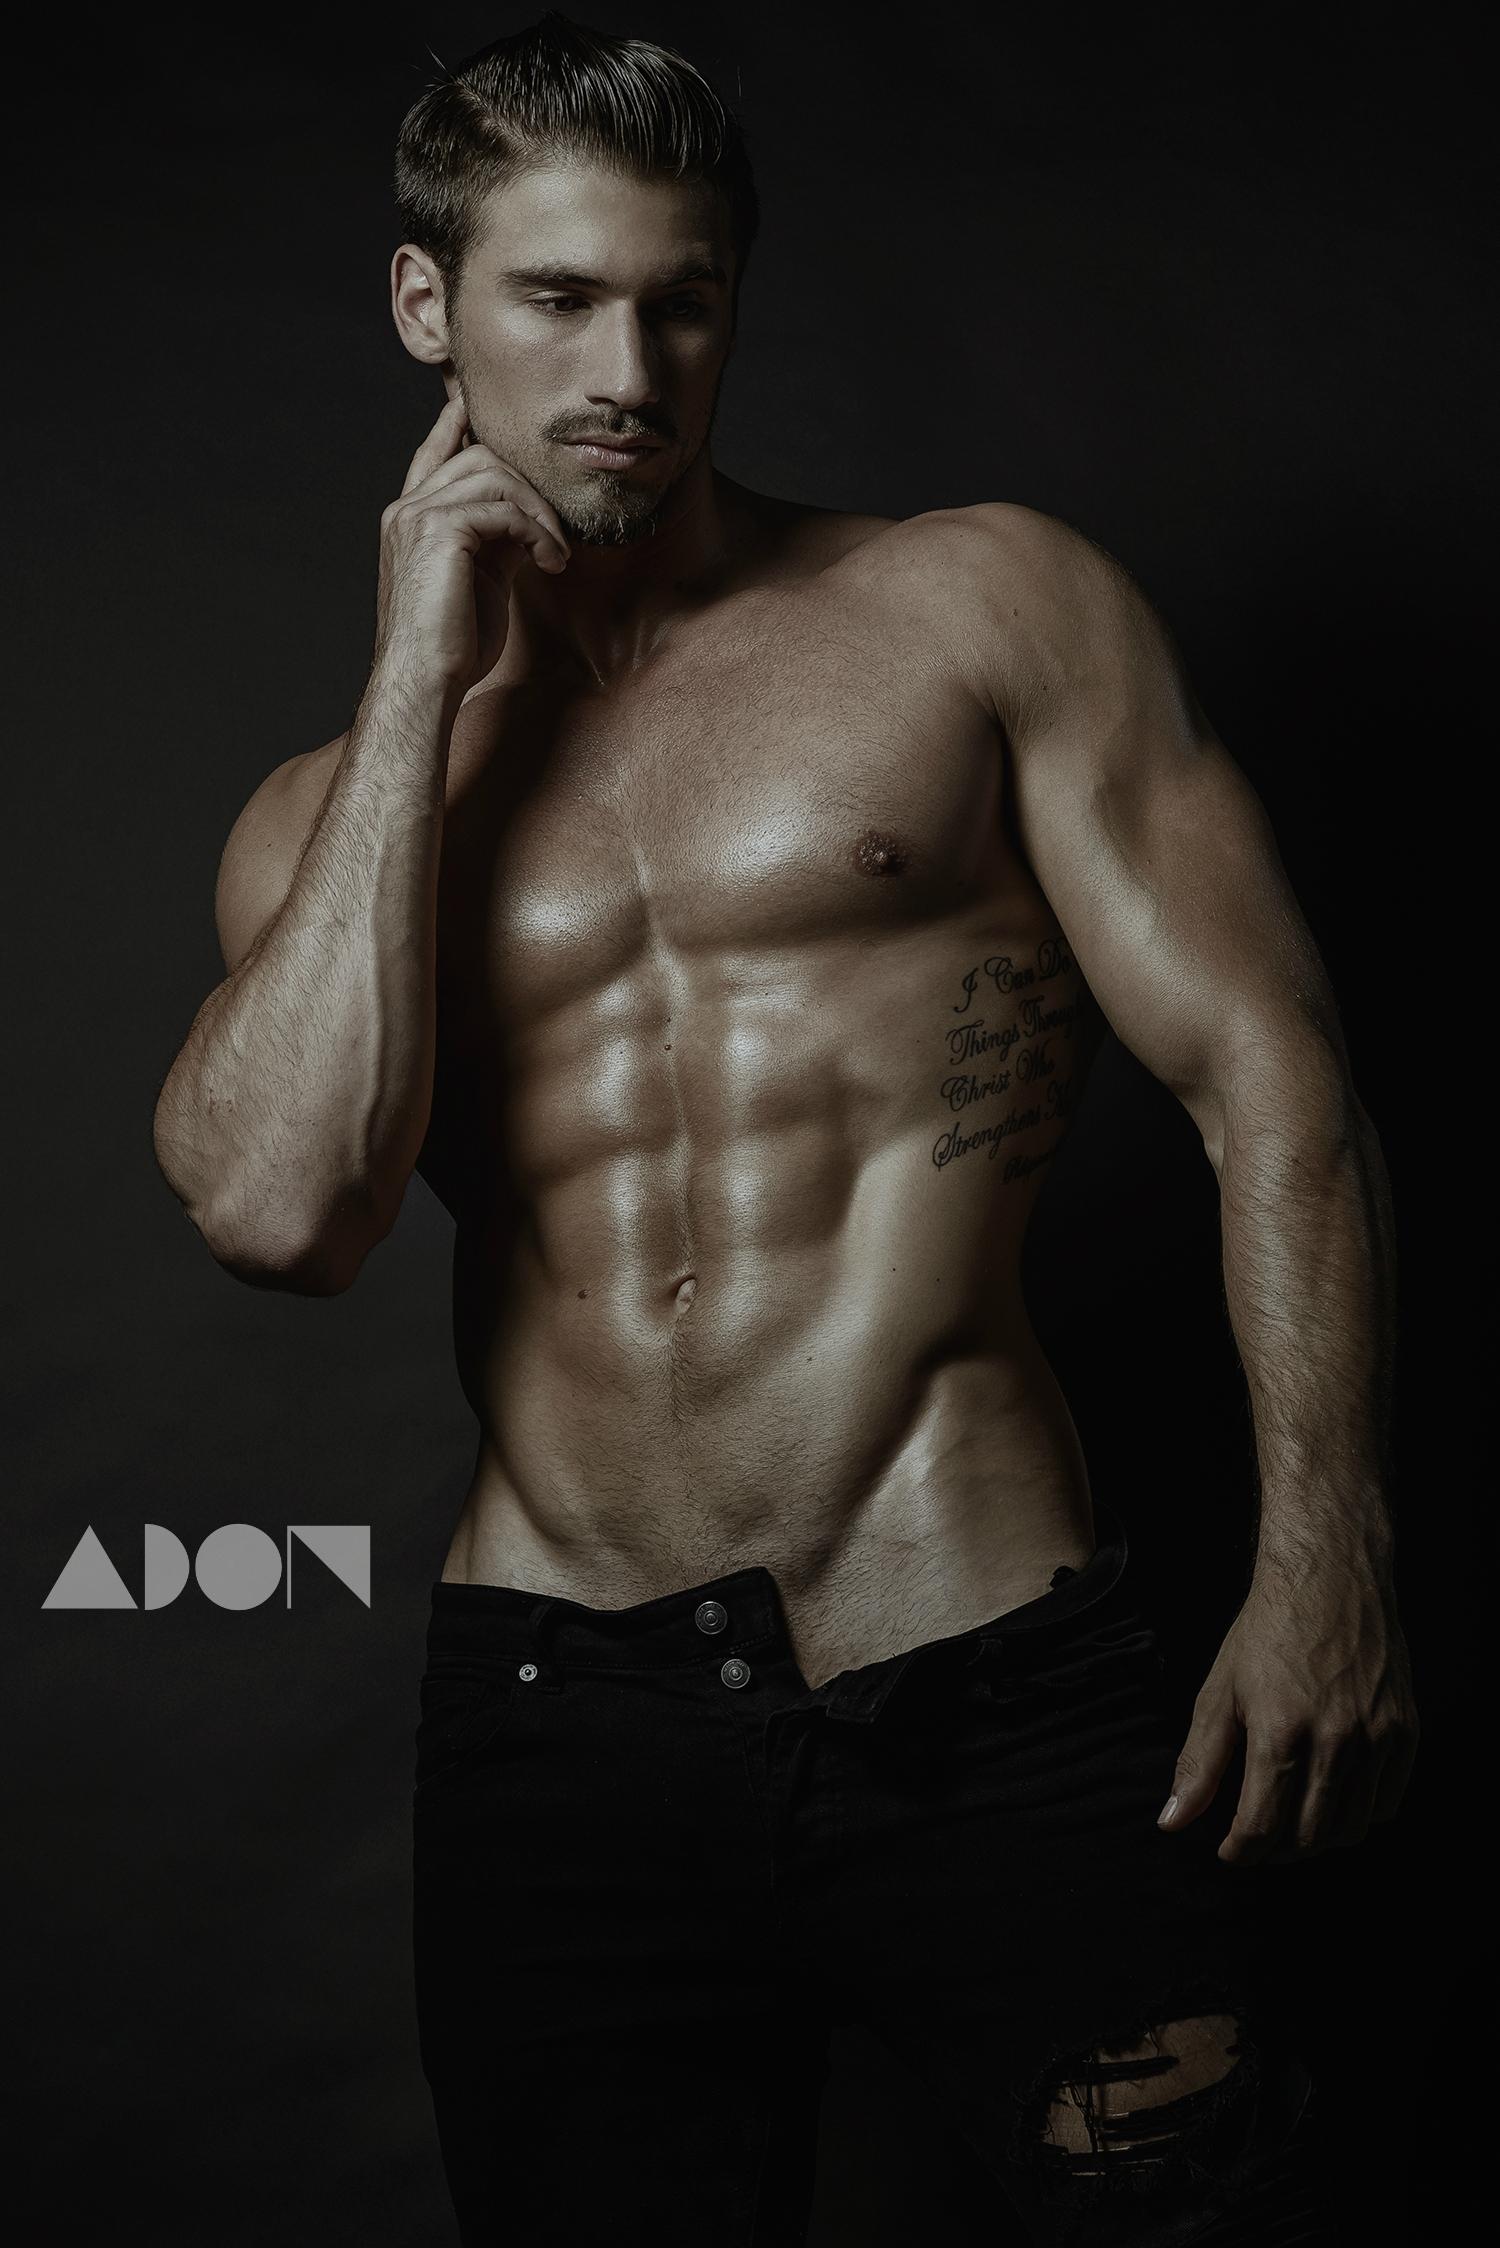 Adon Exclusive: Model COLTON SZOSTEK By Armando Adajar